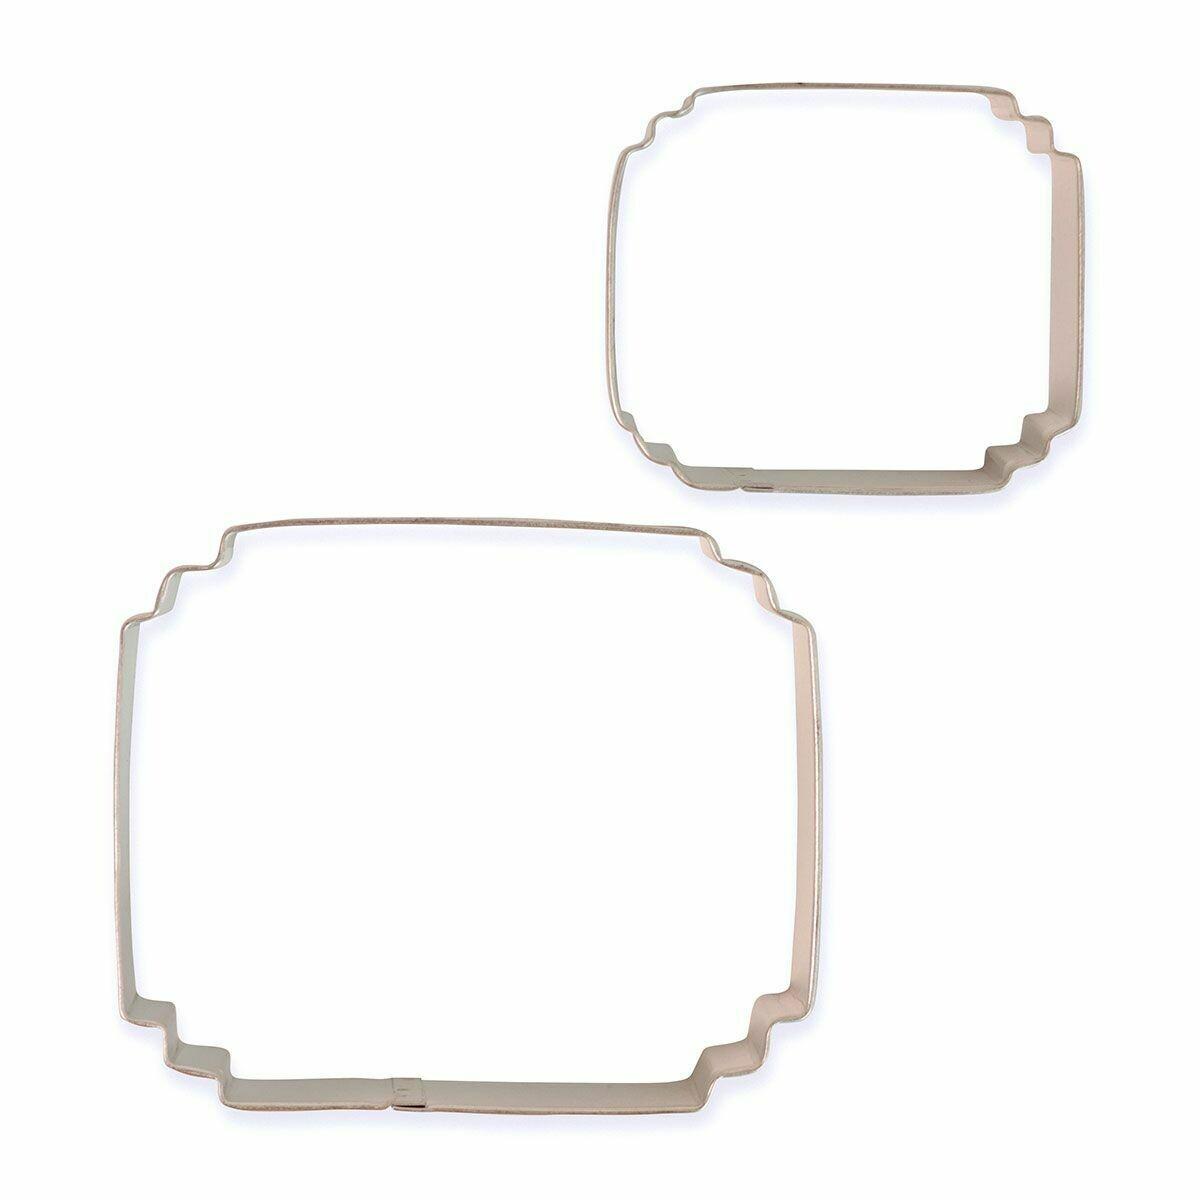 PME Set of 2 Plaque Cutters -STYLE 5 - Σετ 2τεμ κουπ πατ Κορνίζες/πλάκες